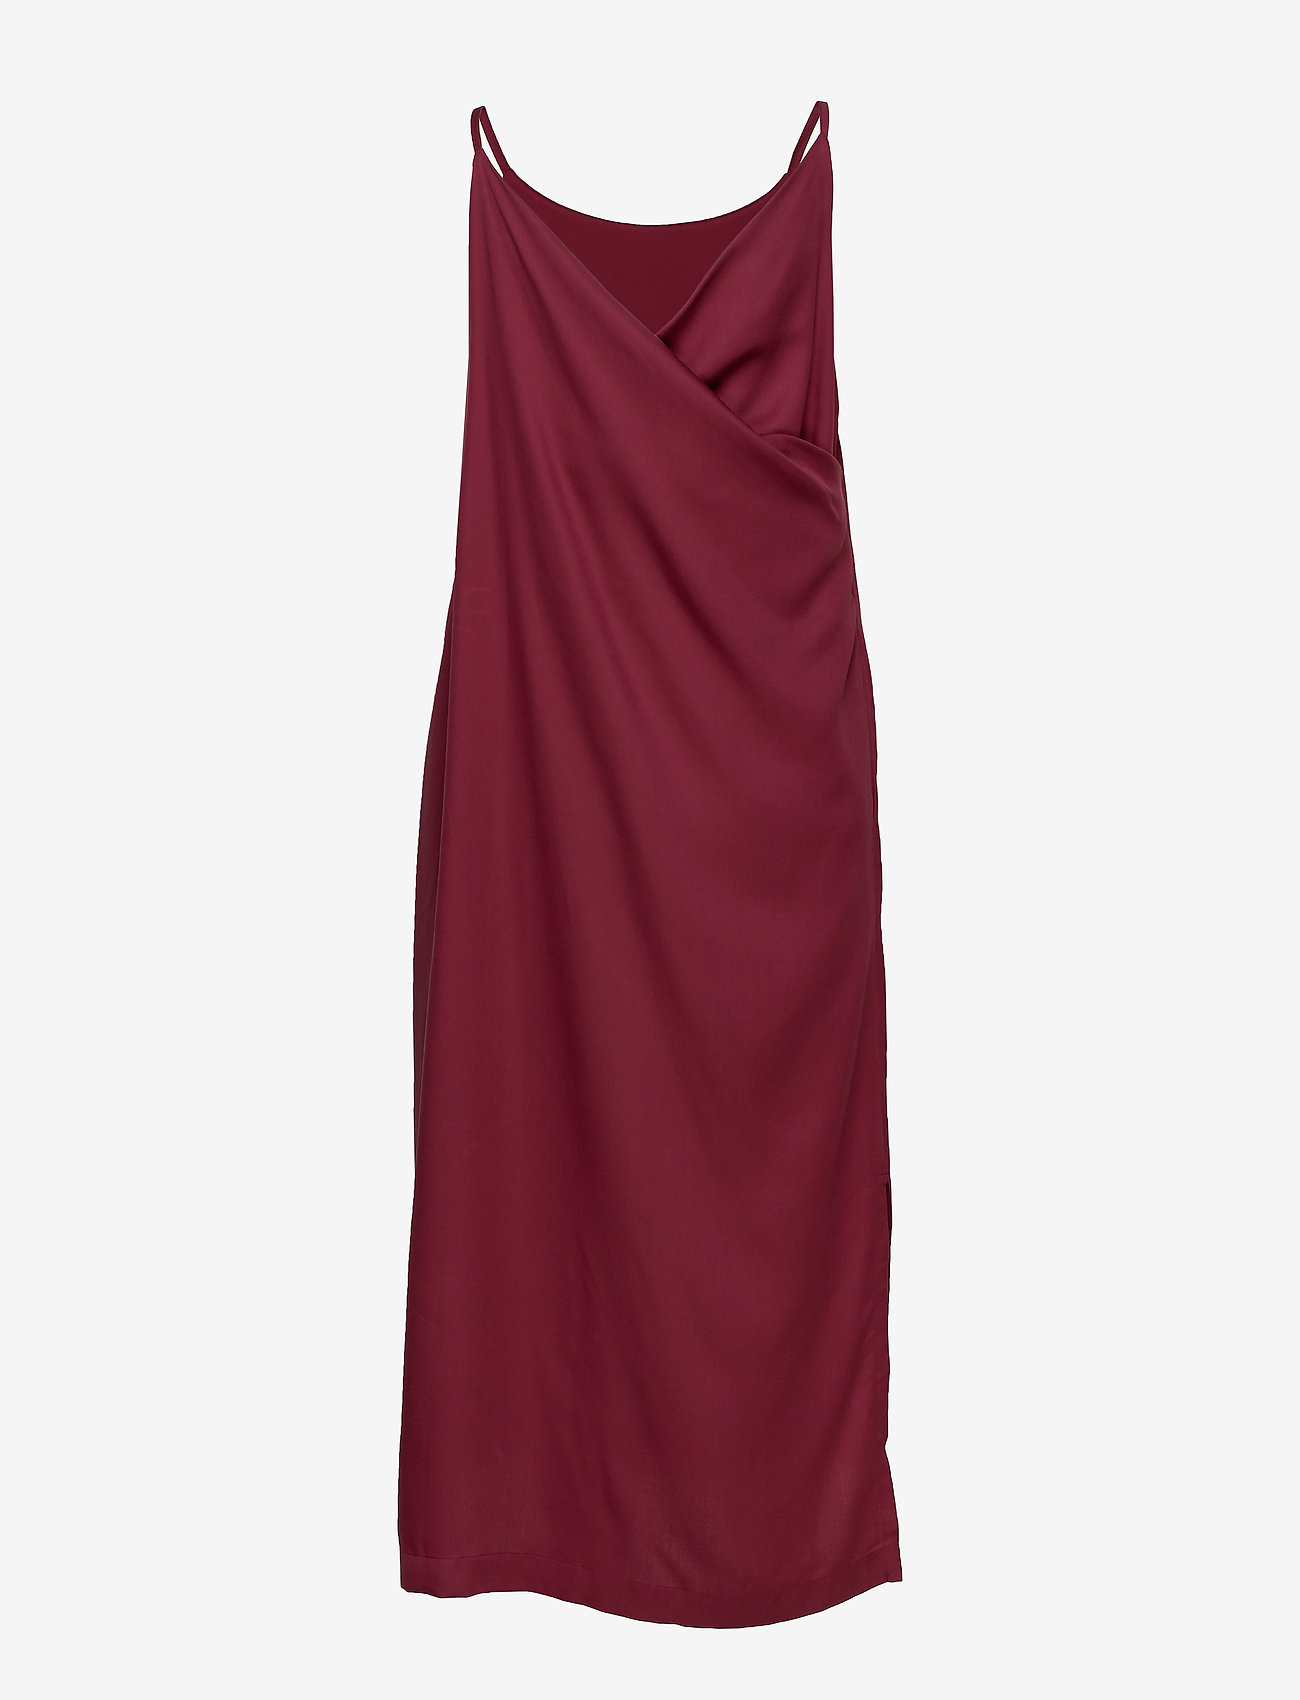 Makia Tara Dress- Robes 9F1aCh82 cBA89 Qu5iId4H